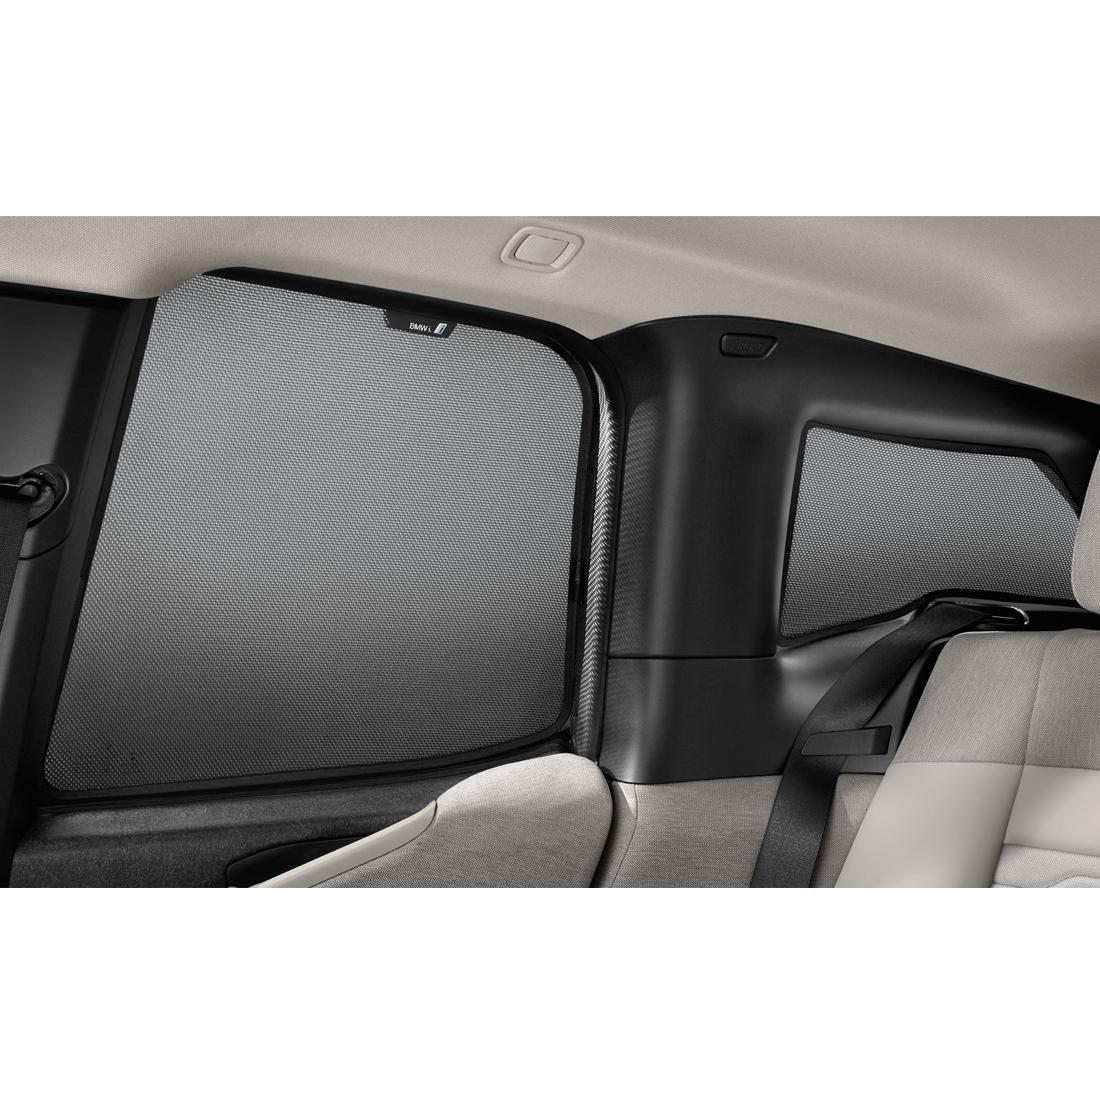 ShopBMWUSA.com: BMW I REAR SUNSHADES